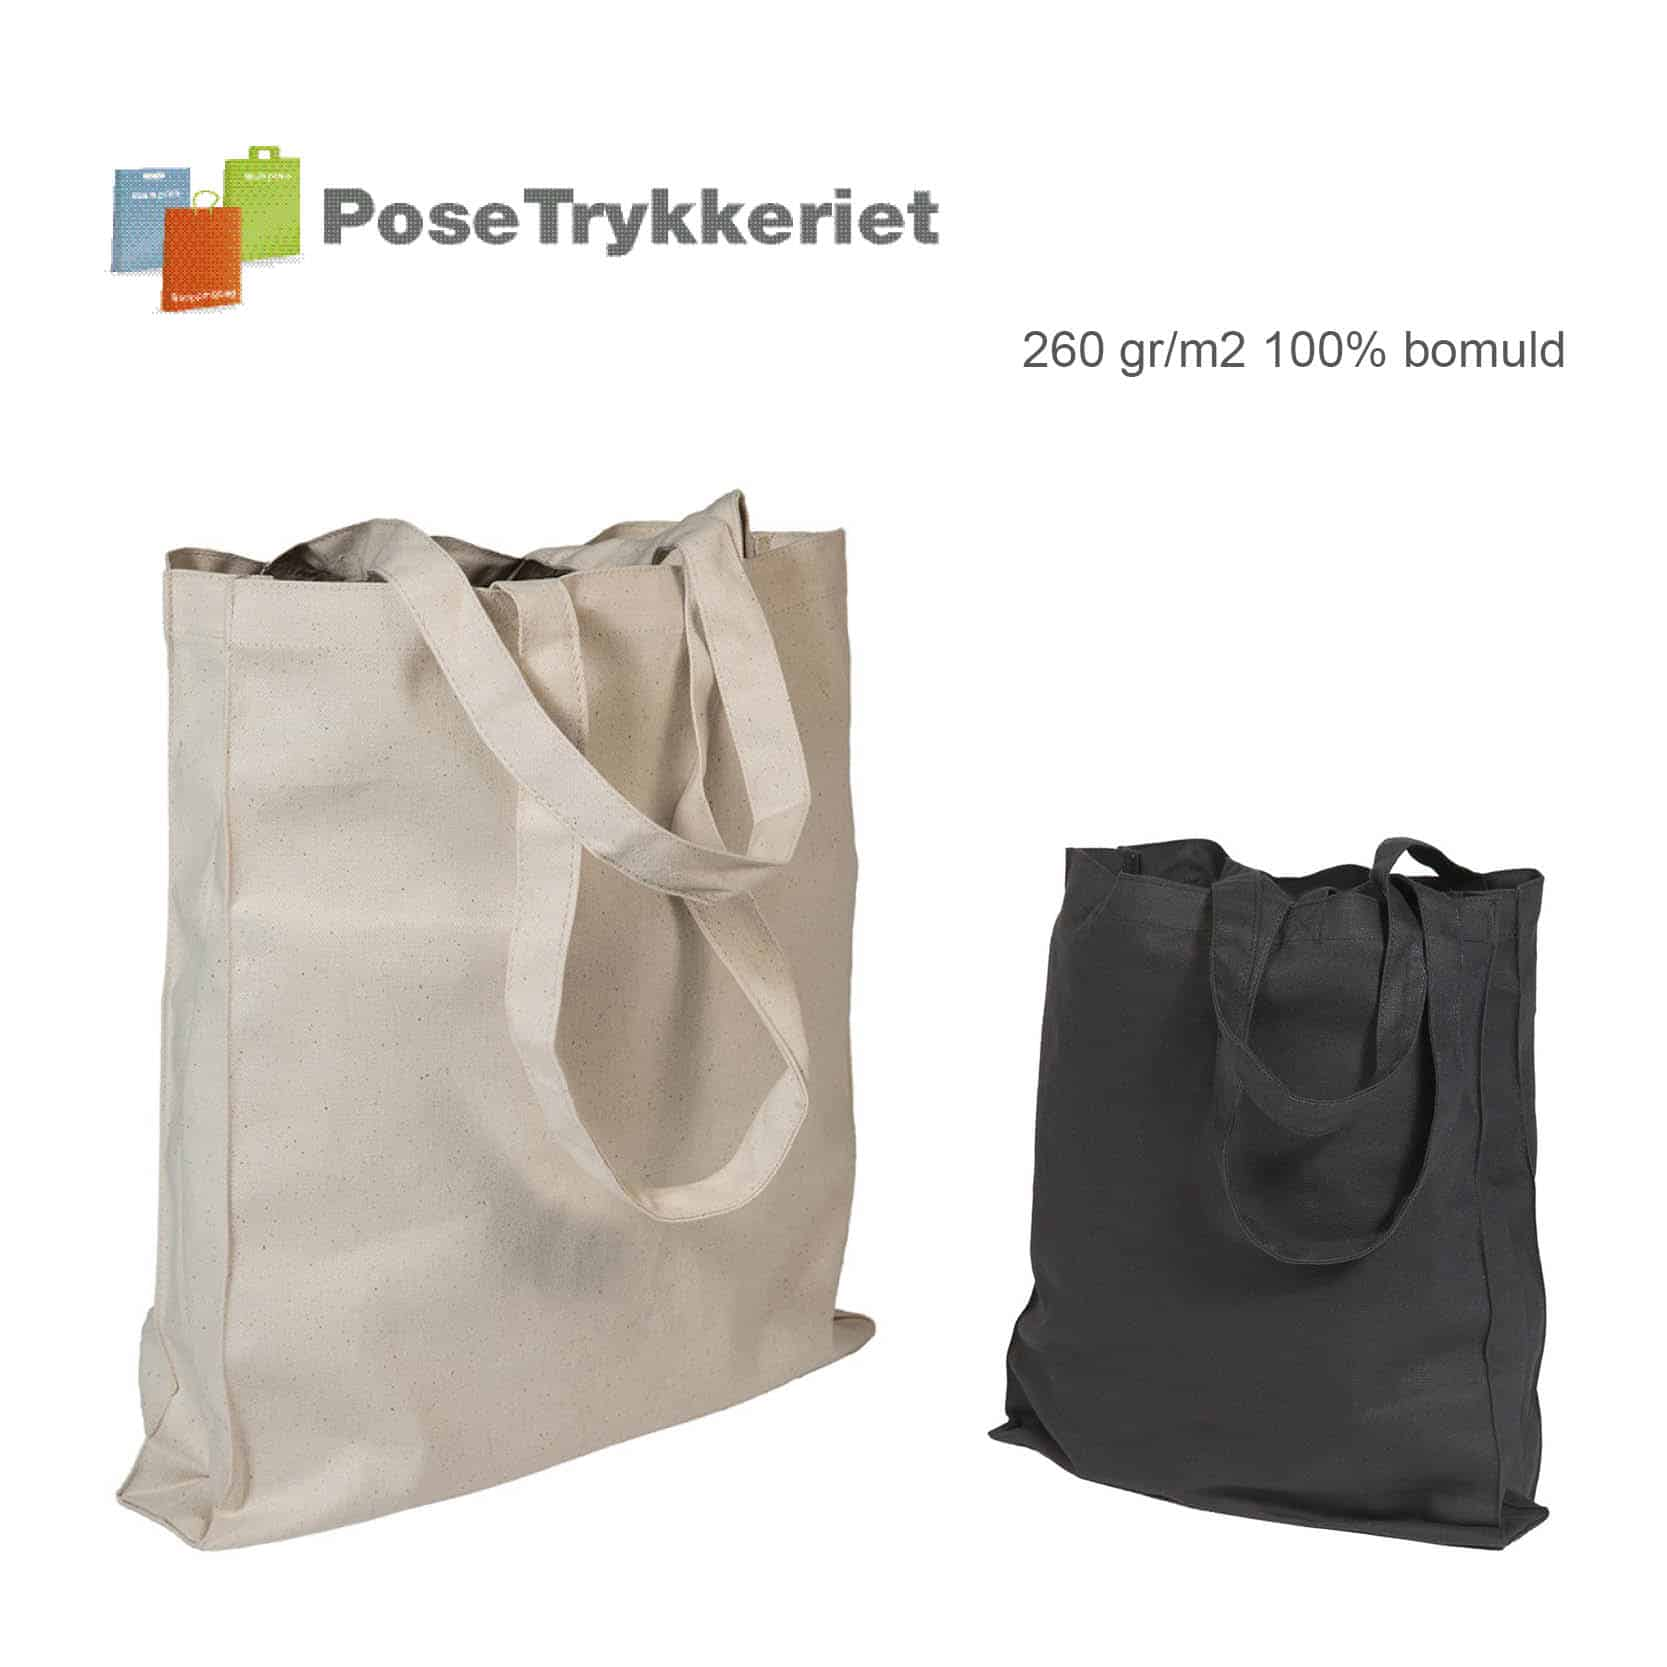 Indkøbsnet i kraftig kvalitet. PoseTrykkeriet.dk